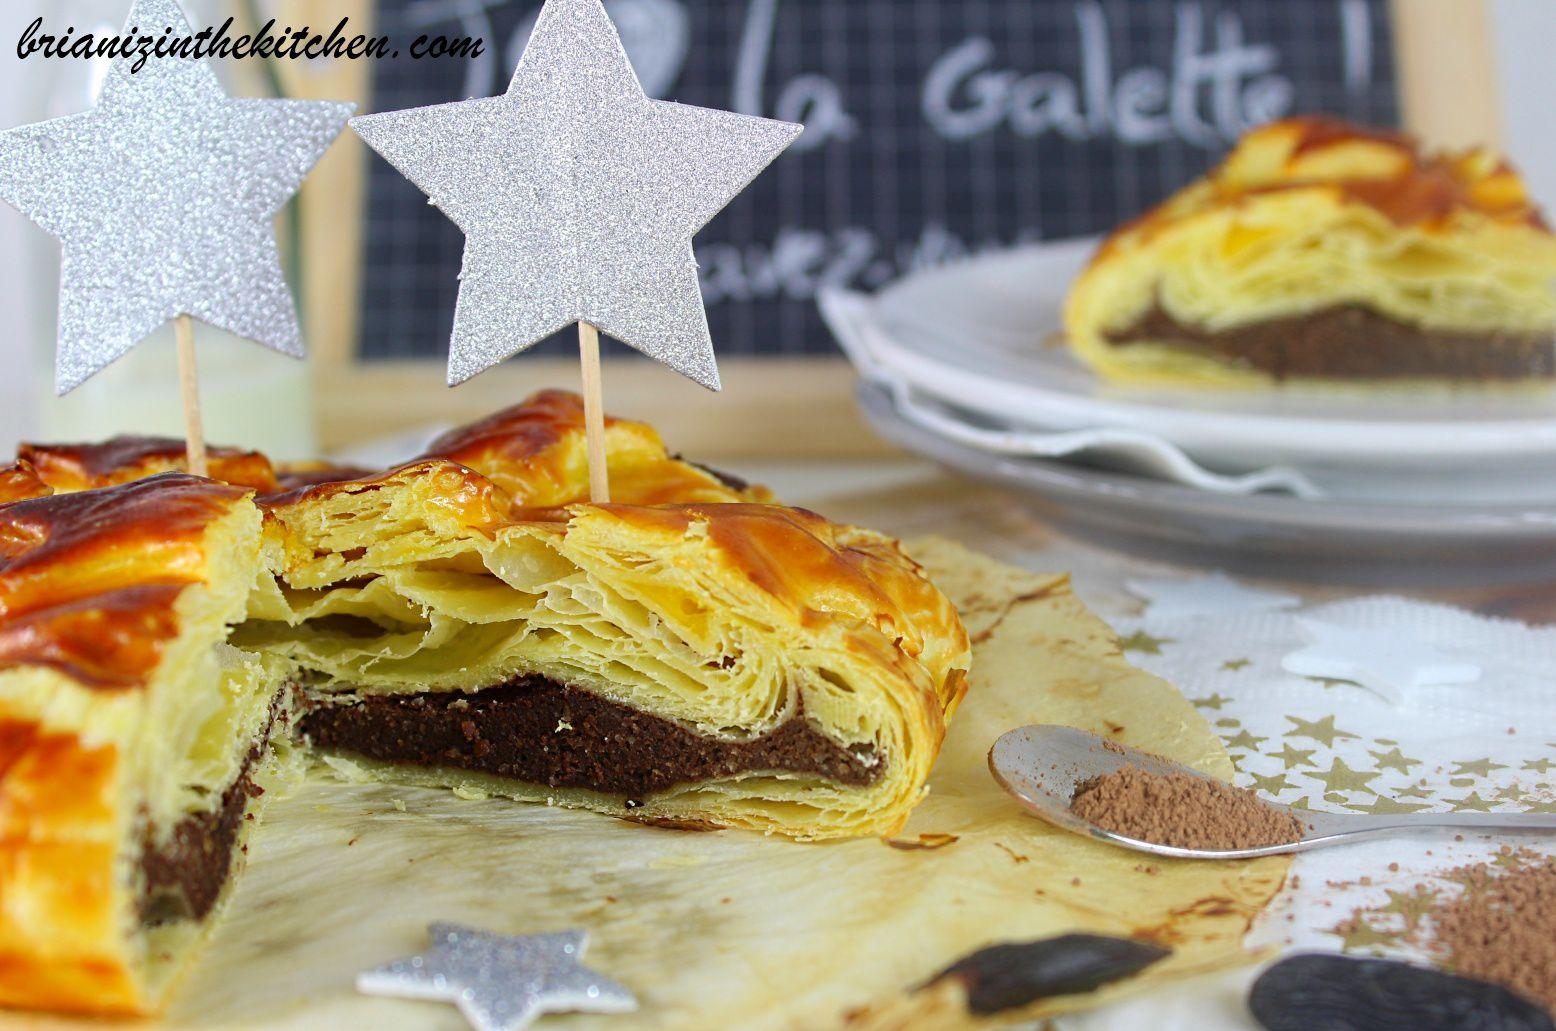 Mini-Galettes Frangipane au Chocolat Blanc &amp&#x3B; Myrtilles